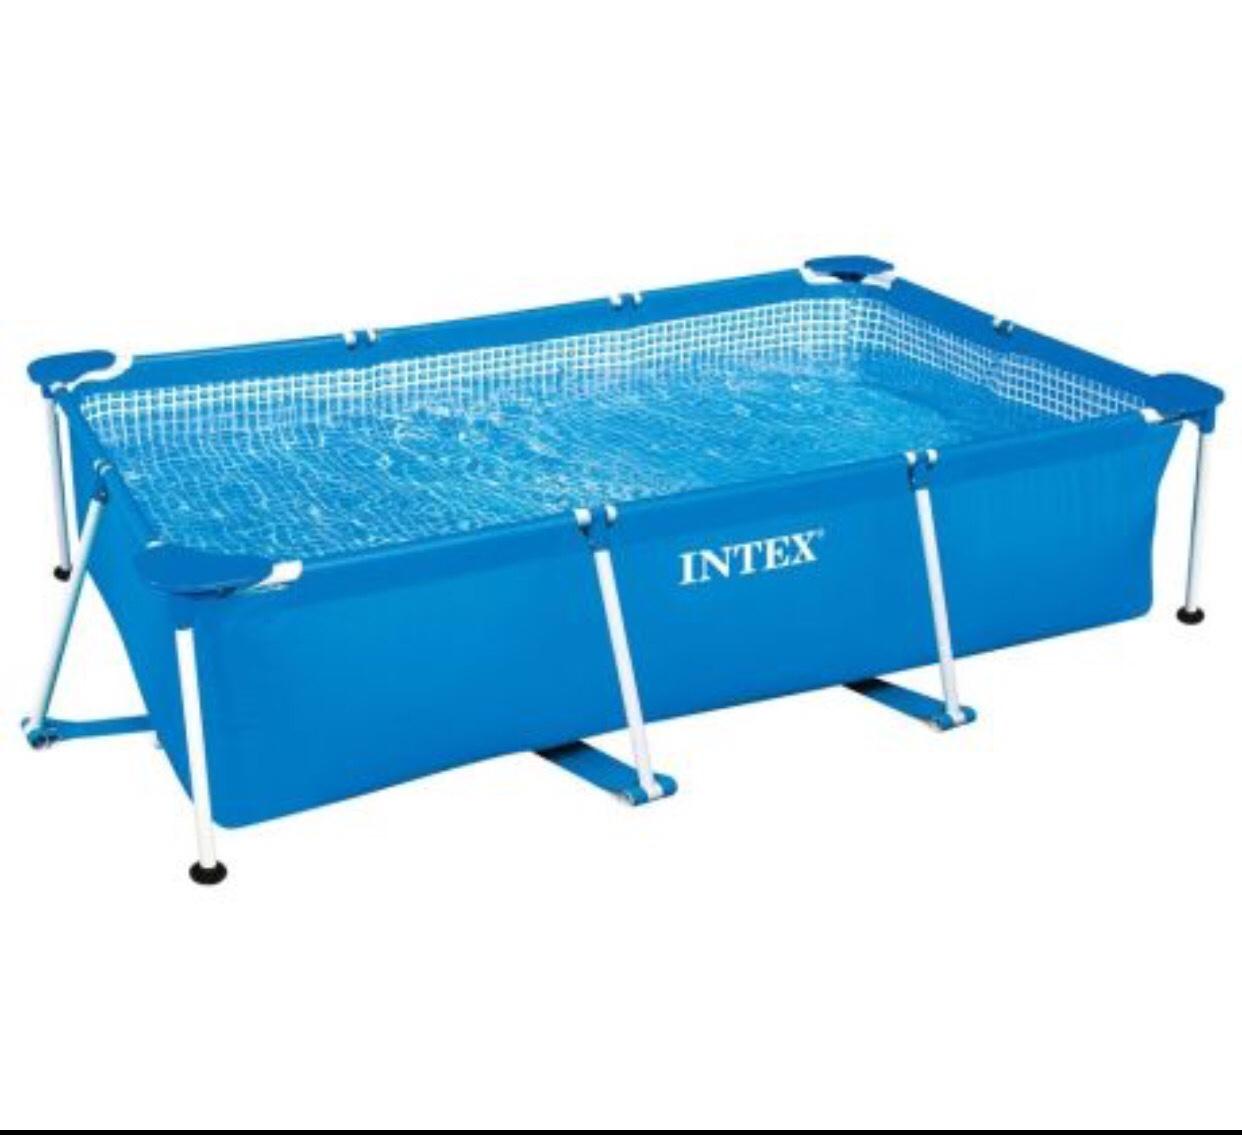 Achetez piscine intex occasion annonce vente besan on for Vendeur piscine